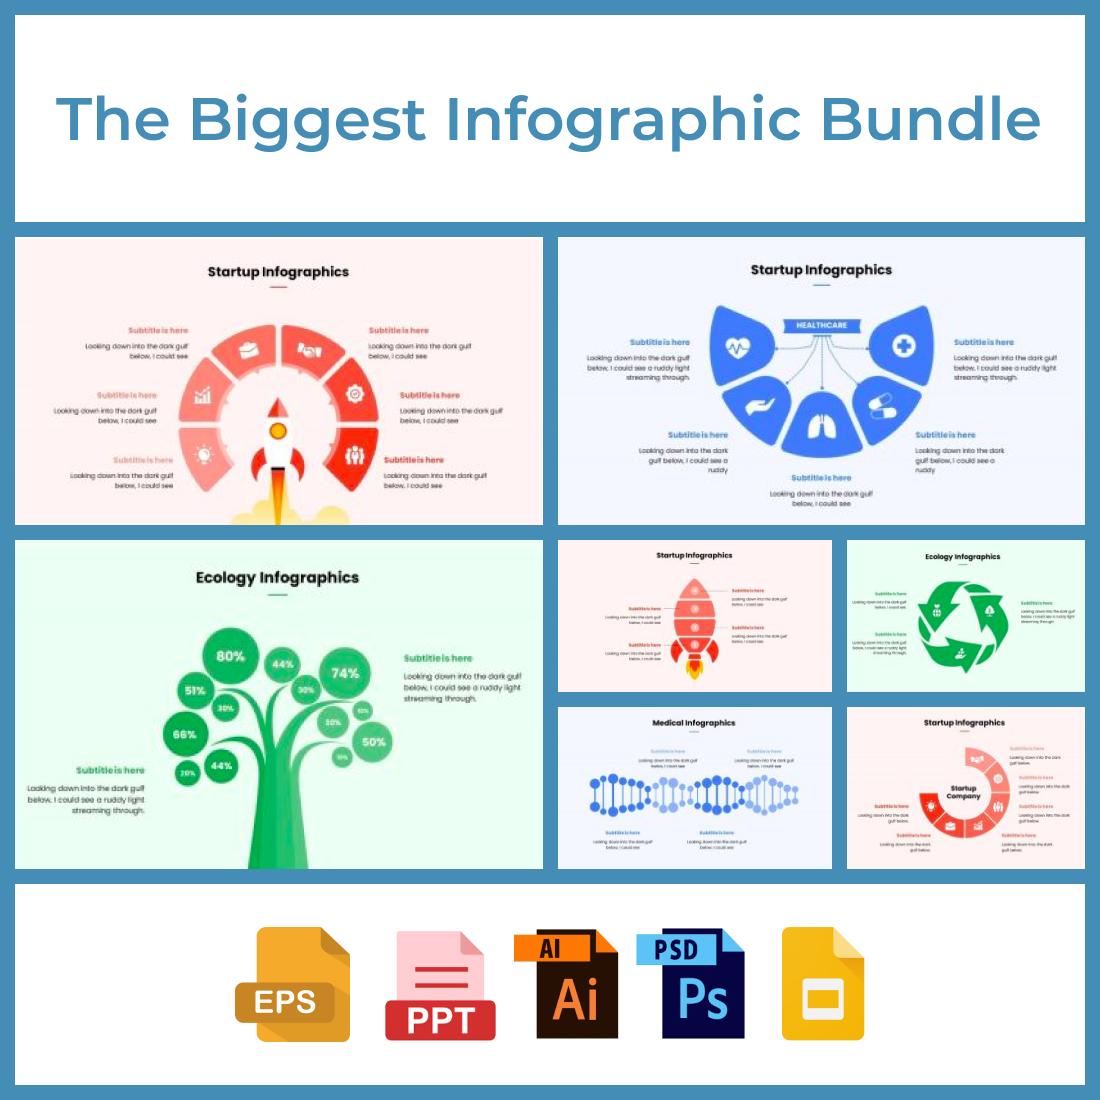 2 The Biggest Infographic Bundle